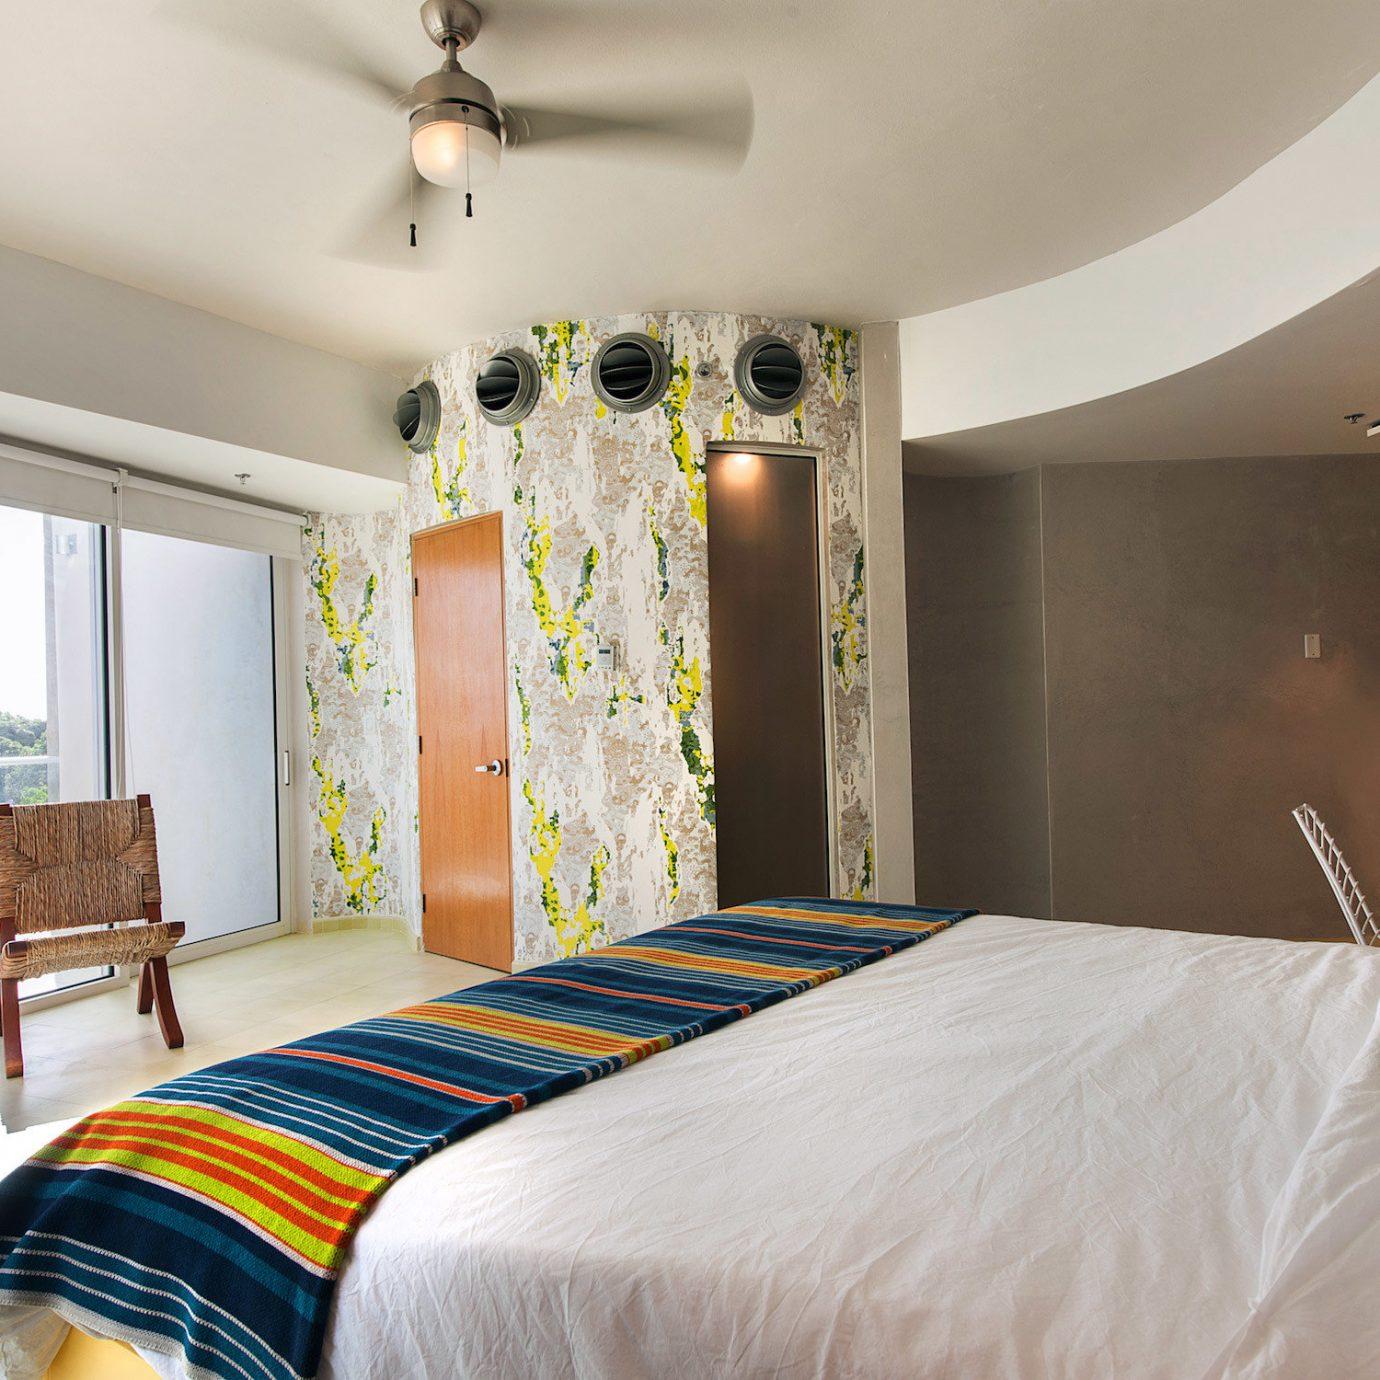 Boutique Hip Modern Trip Ideas Bedroom property scene Suite cottage bed sheet